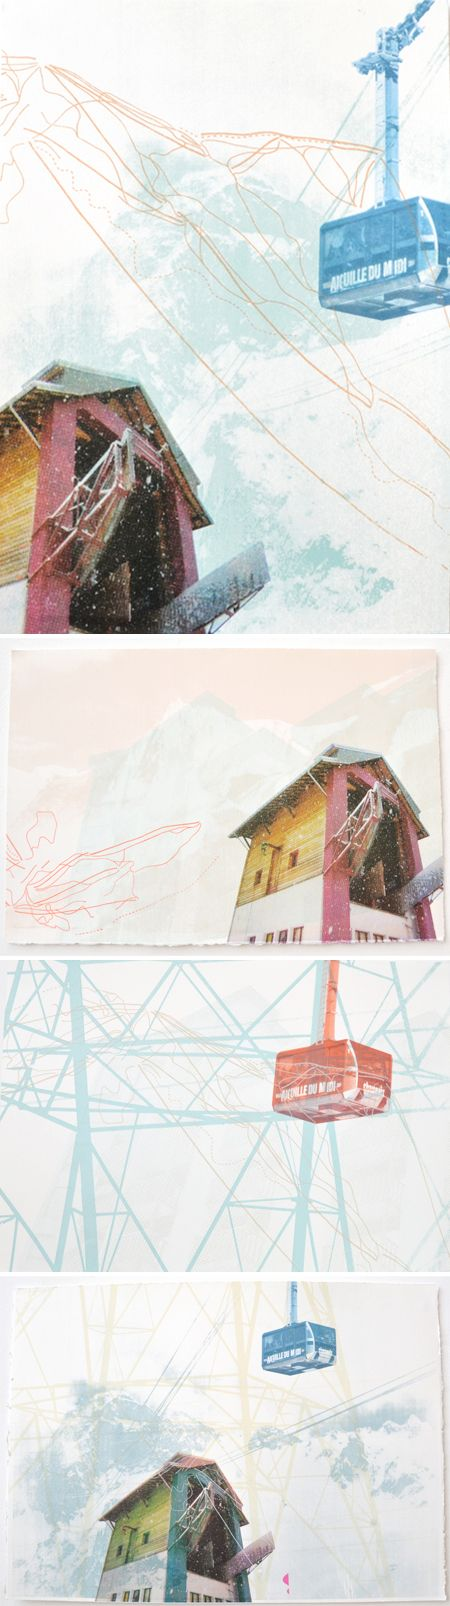 "emily moore - screenprints from ""chamonix"" series"